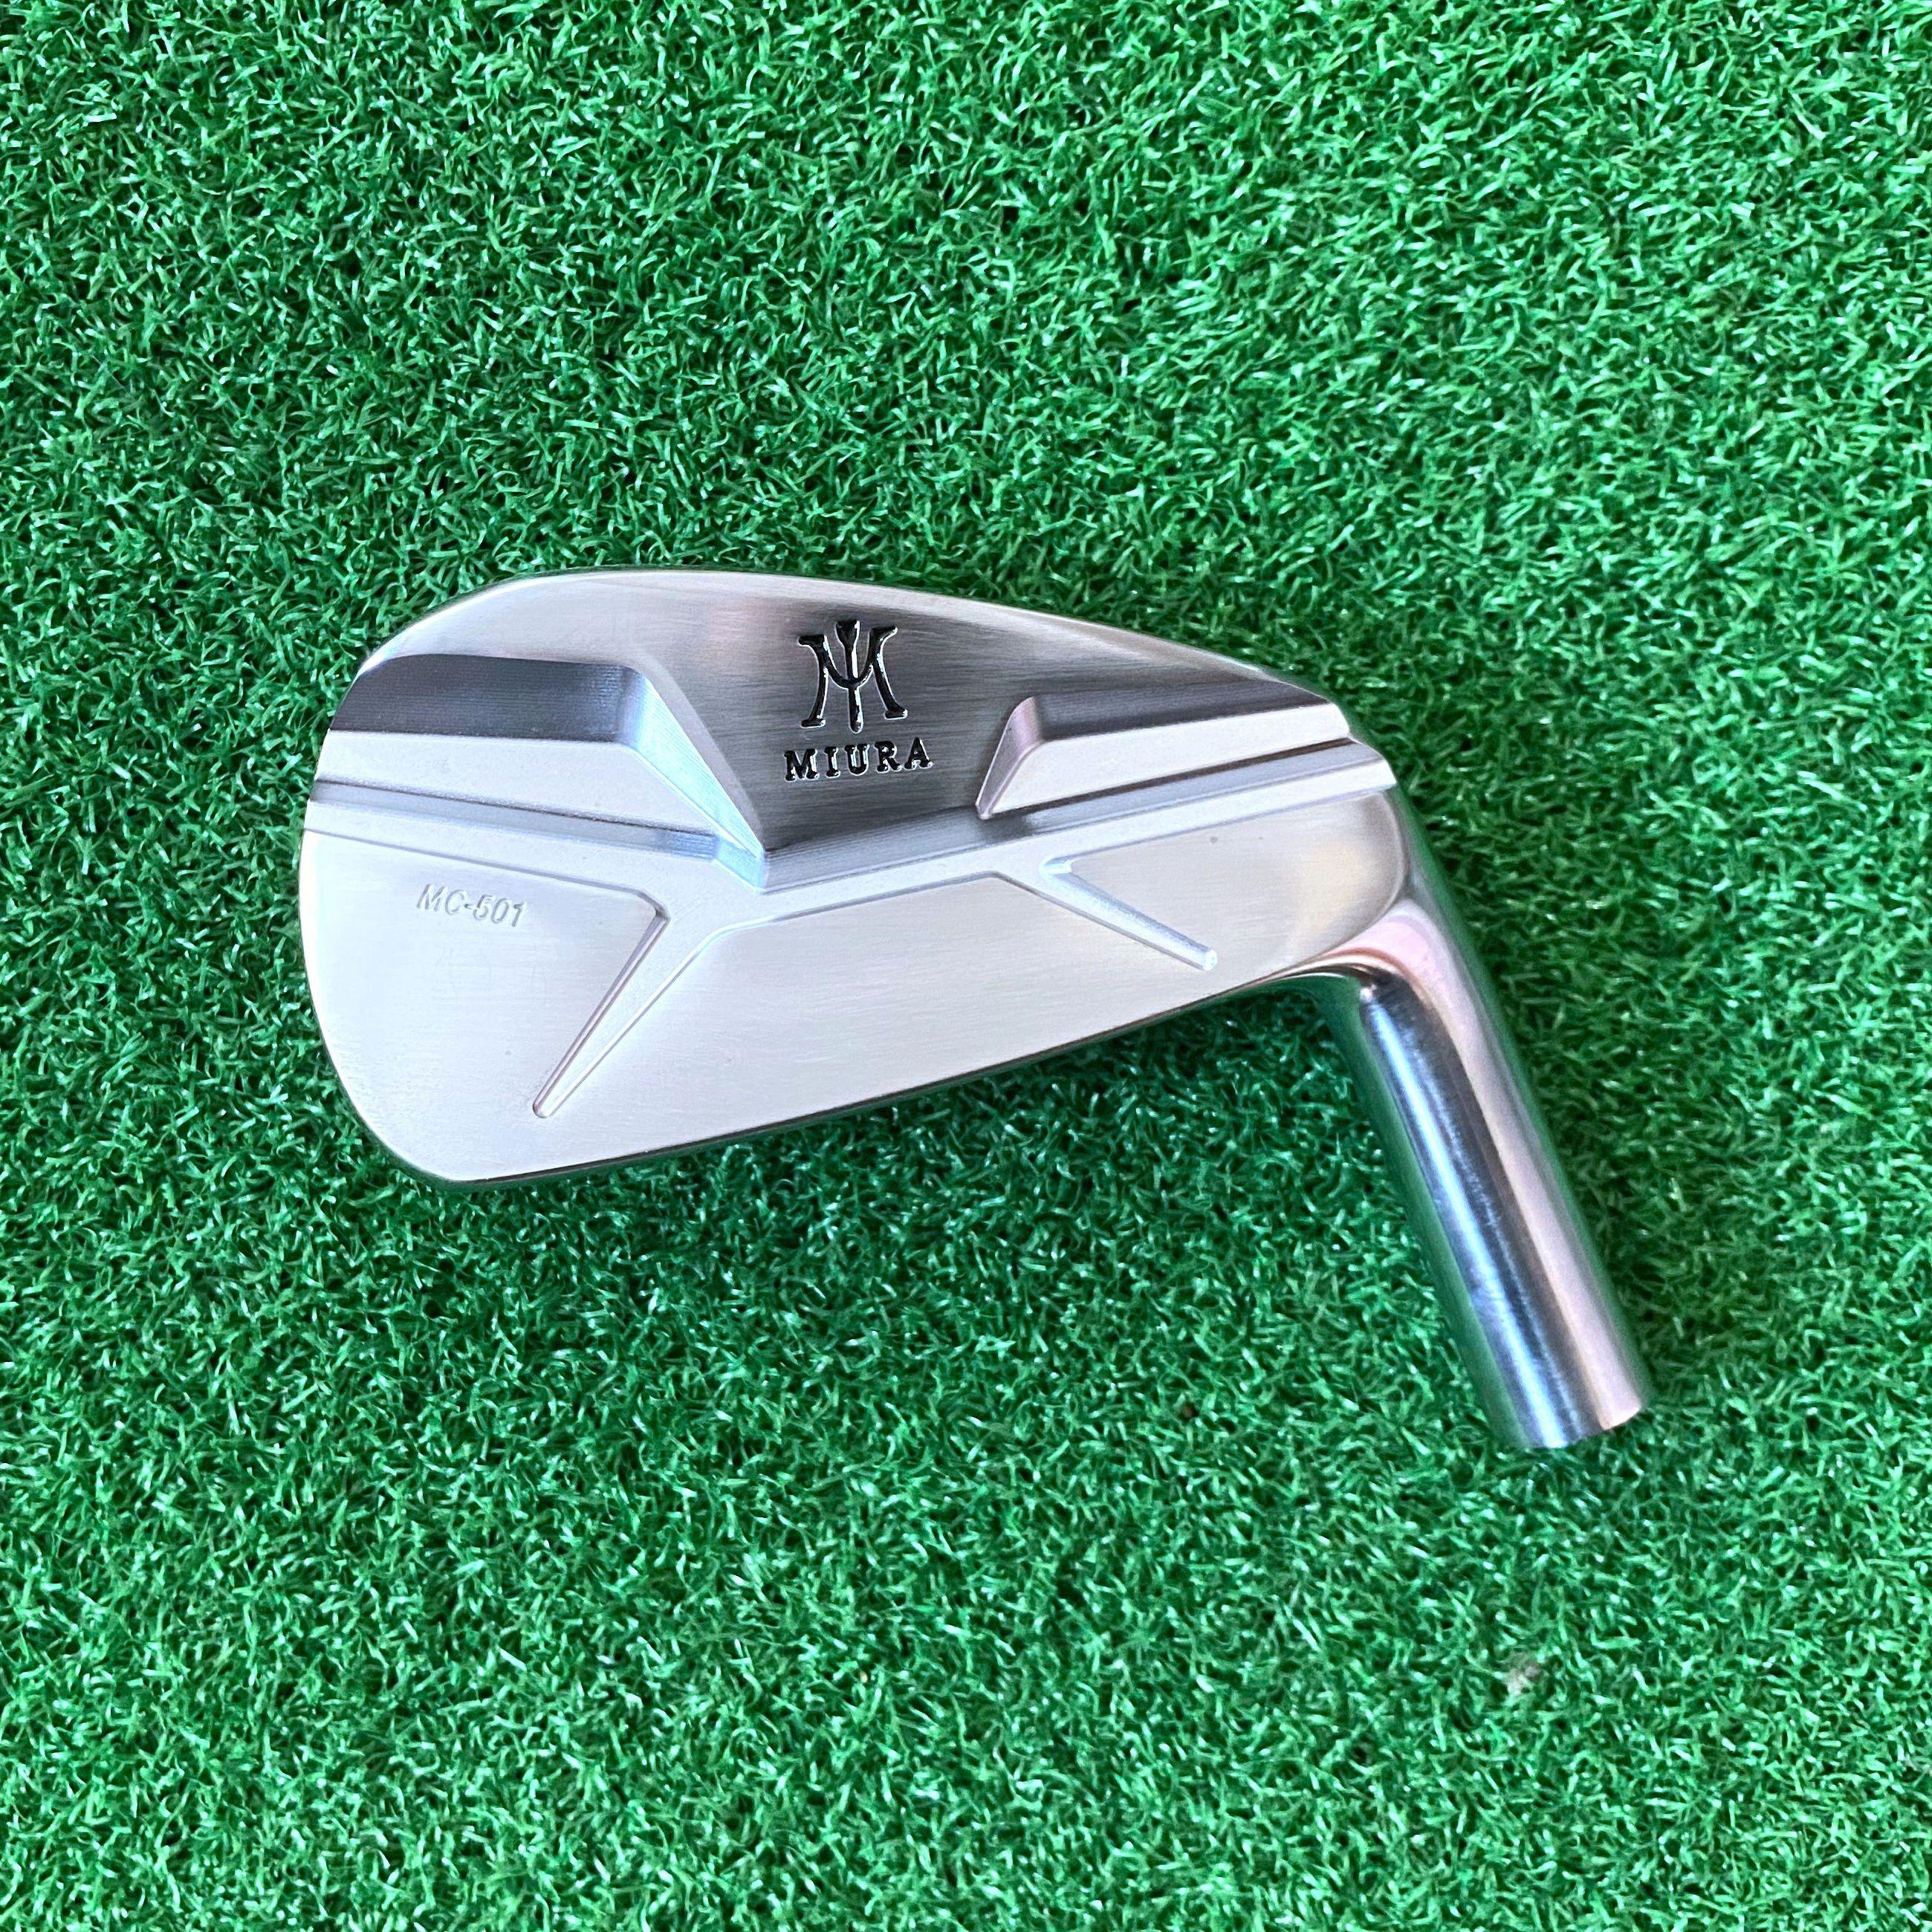 Golf Clubs Irons Head No Shaft Miura-mc501 Free Shipping Soft Iron Forged 4-P 7PCS Men